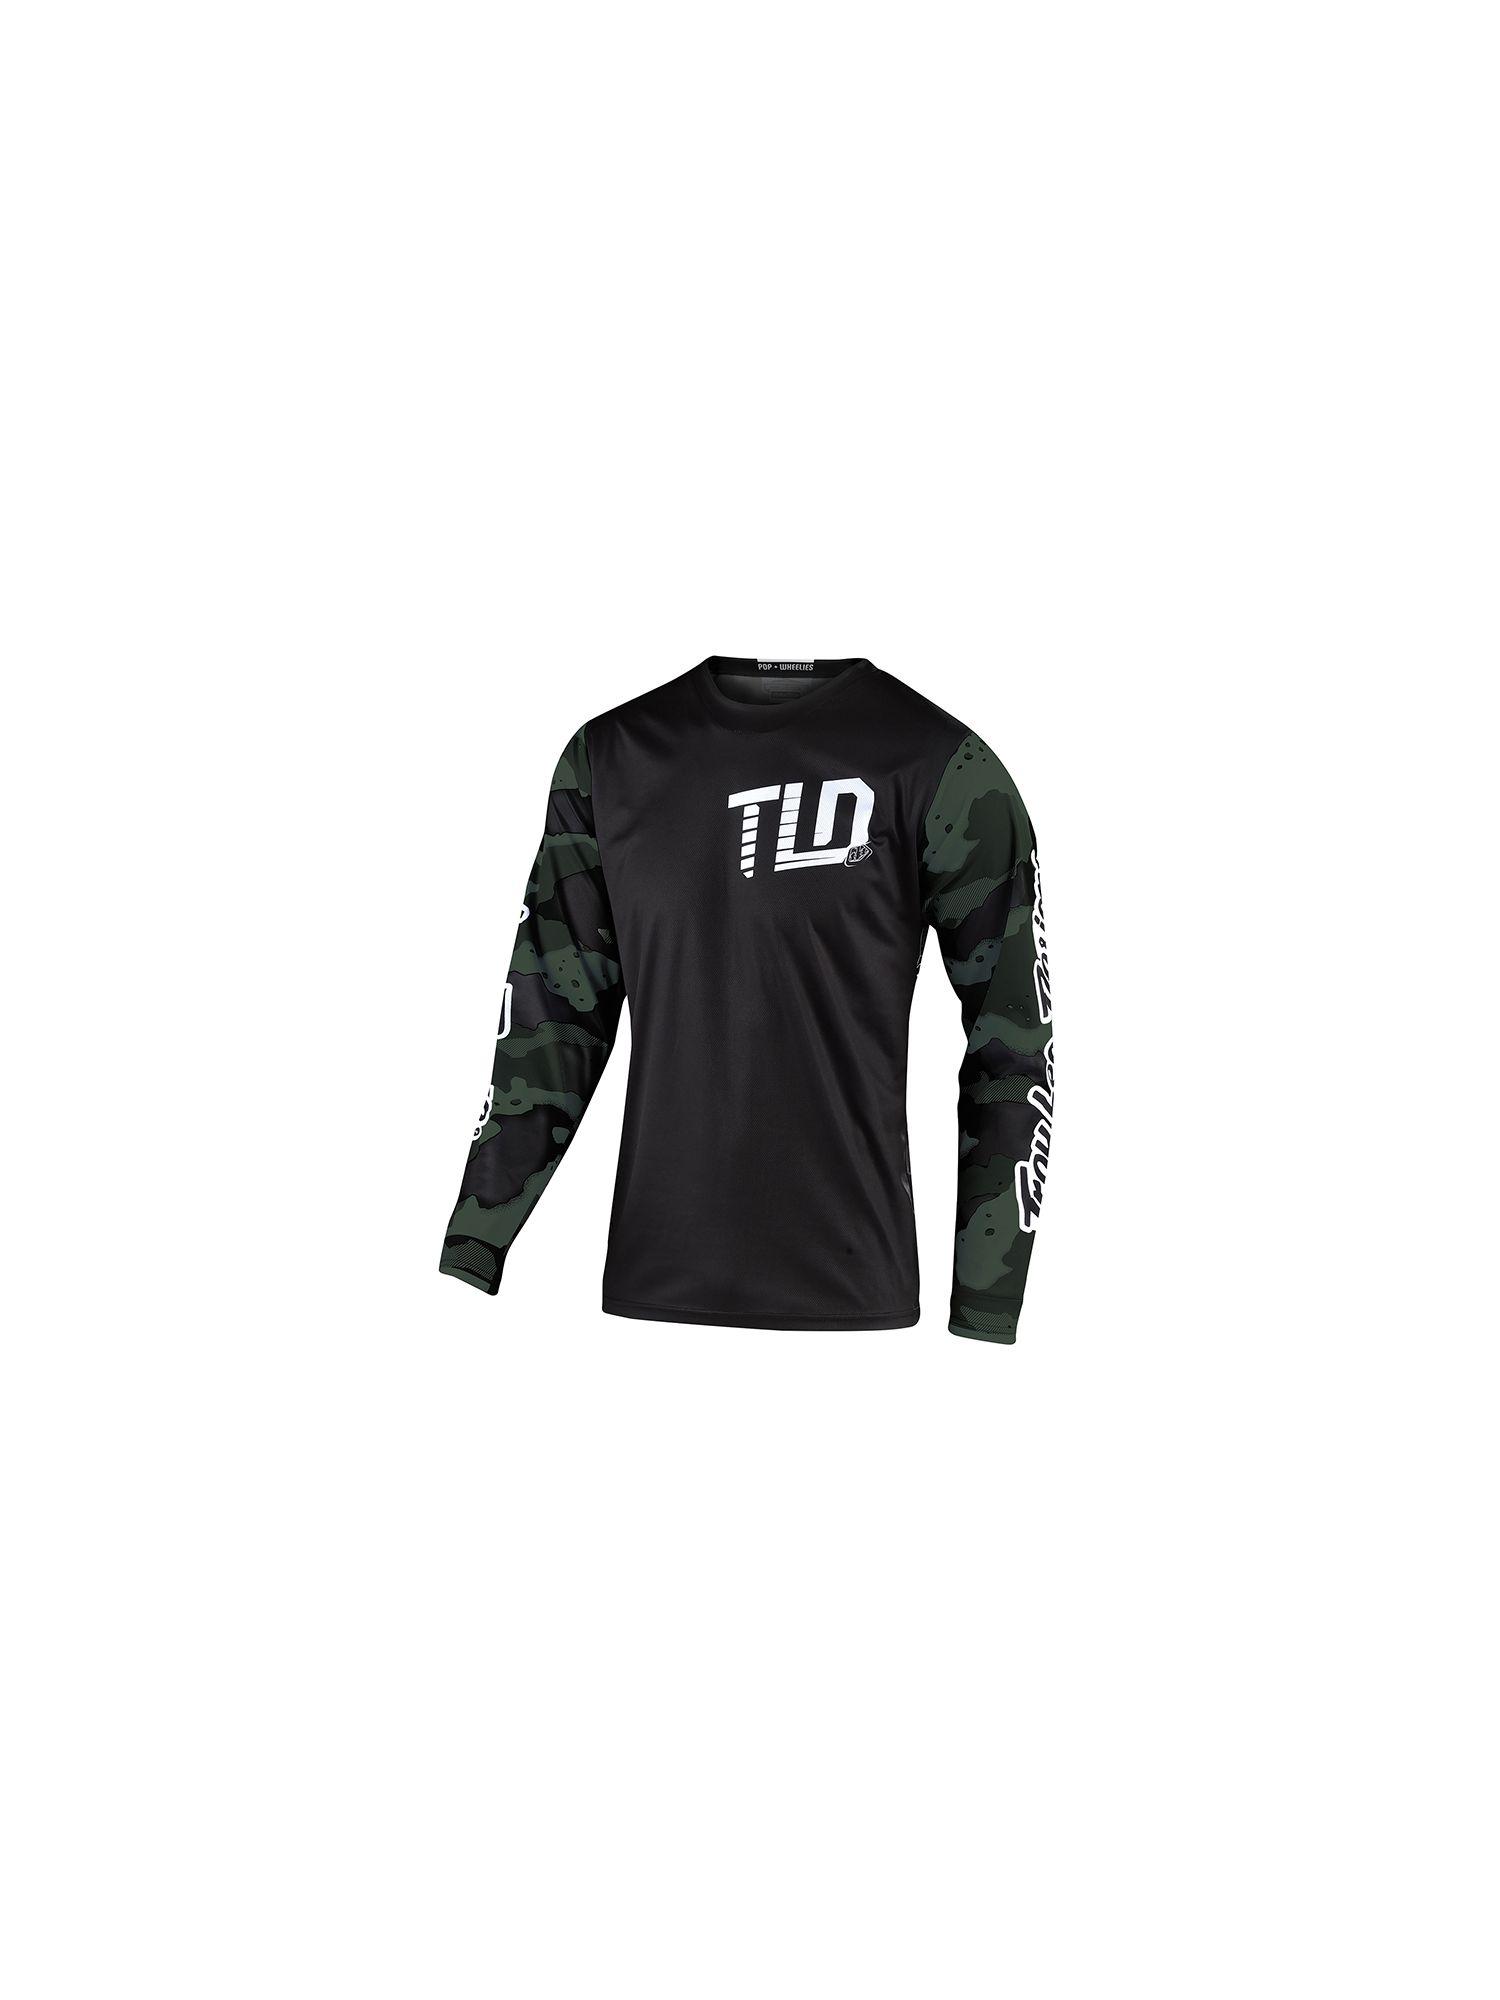 TDU225 GP ジャージ[6colors]